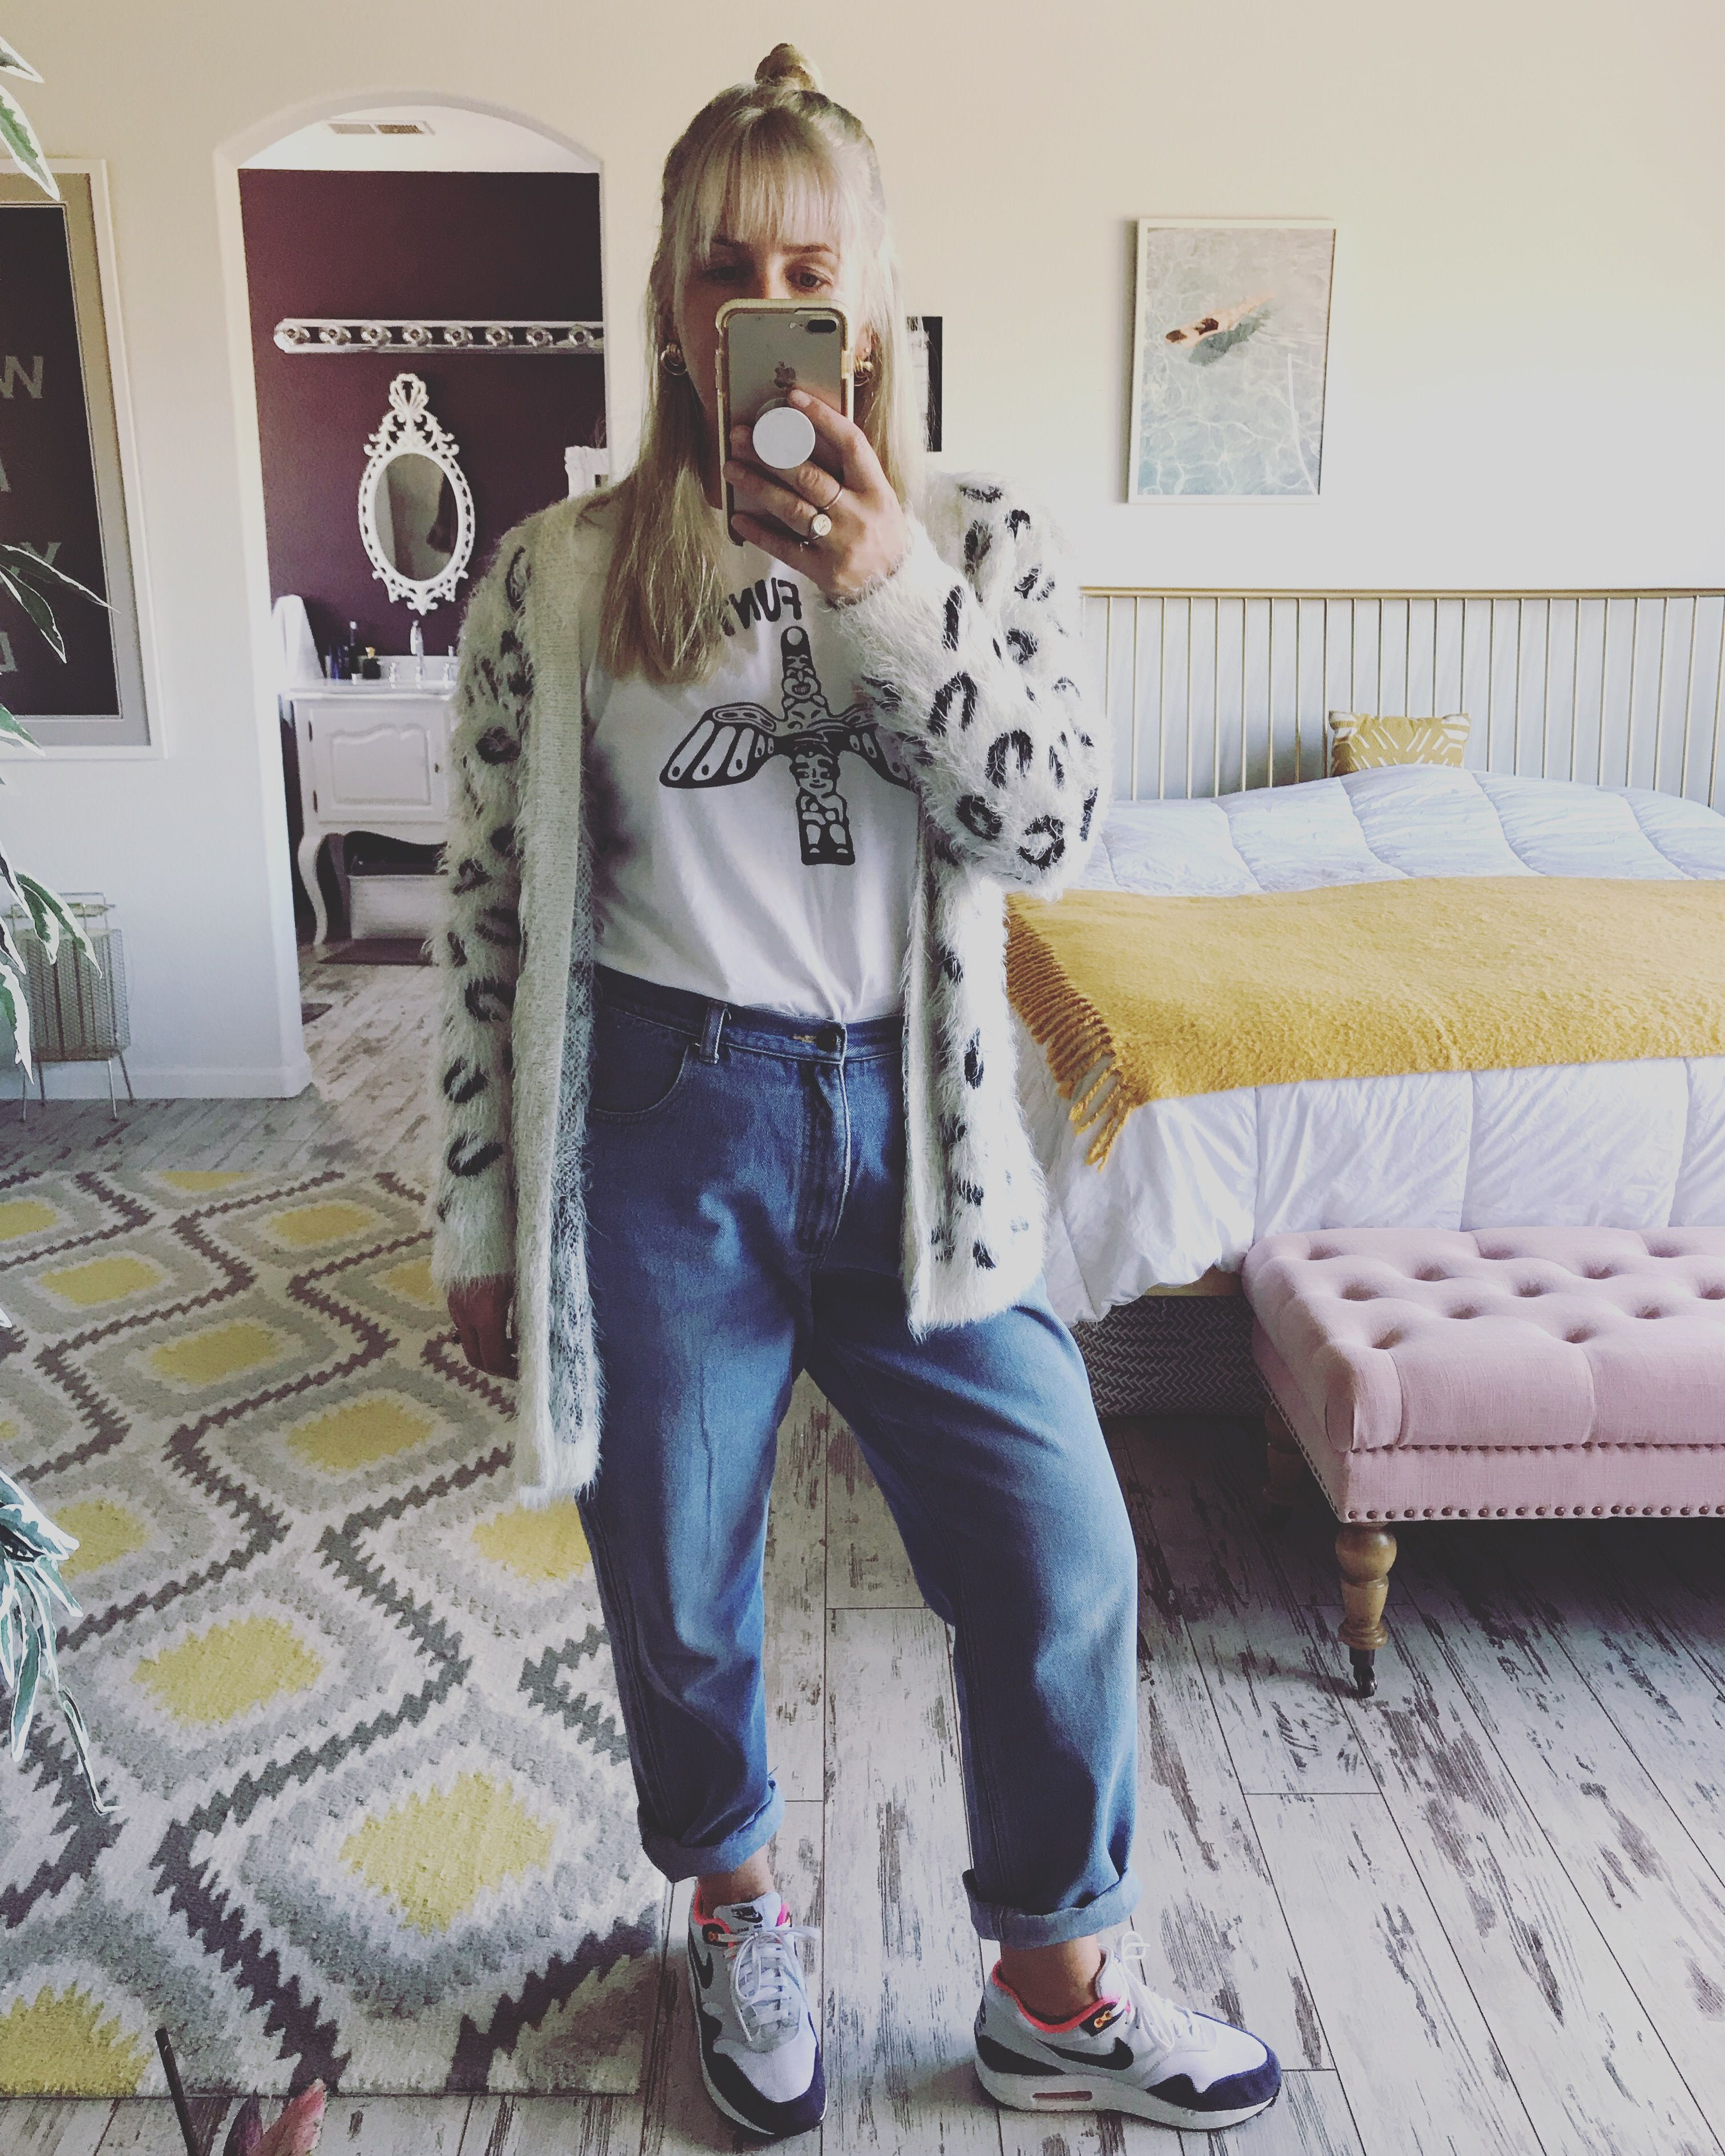 Estar confundido Inmuebles Noticias  Thrifted mom jeans + cardigan, Nike Air Max 1 #ootd | Yoga clothing brands,  Mom jeans, Clothing brand